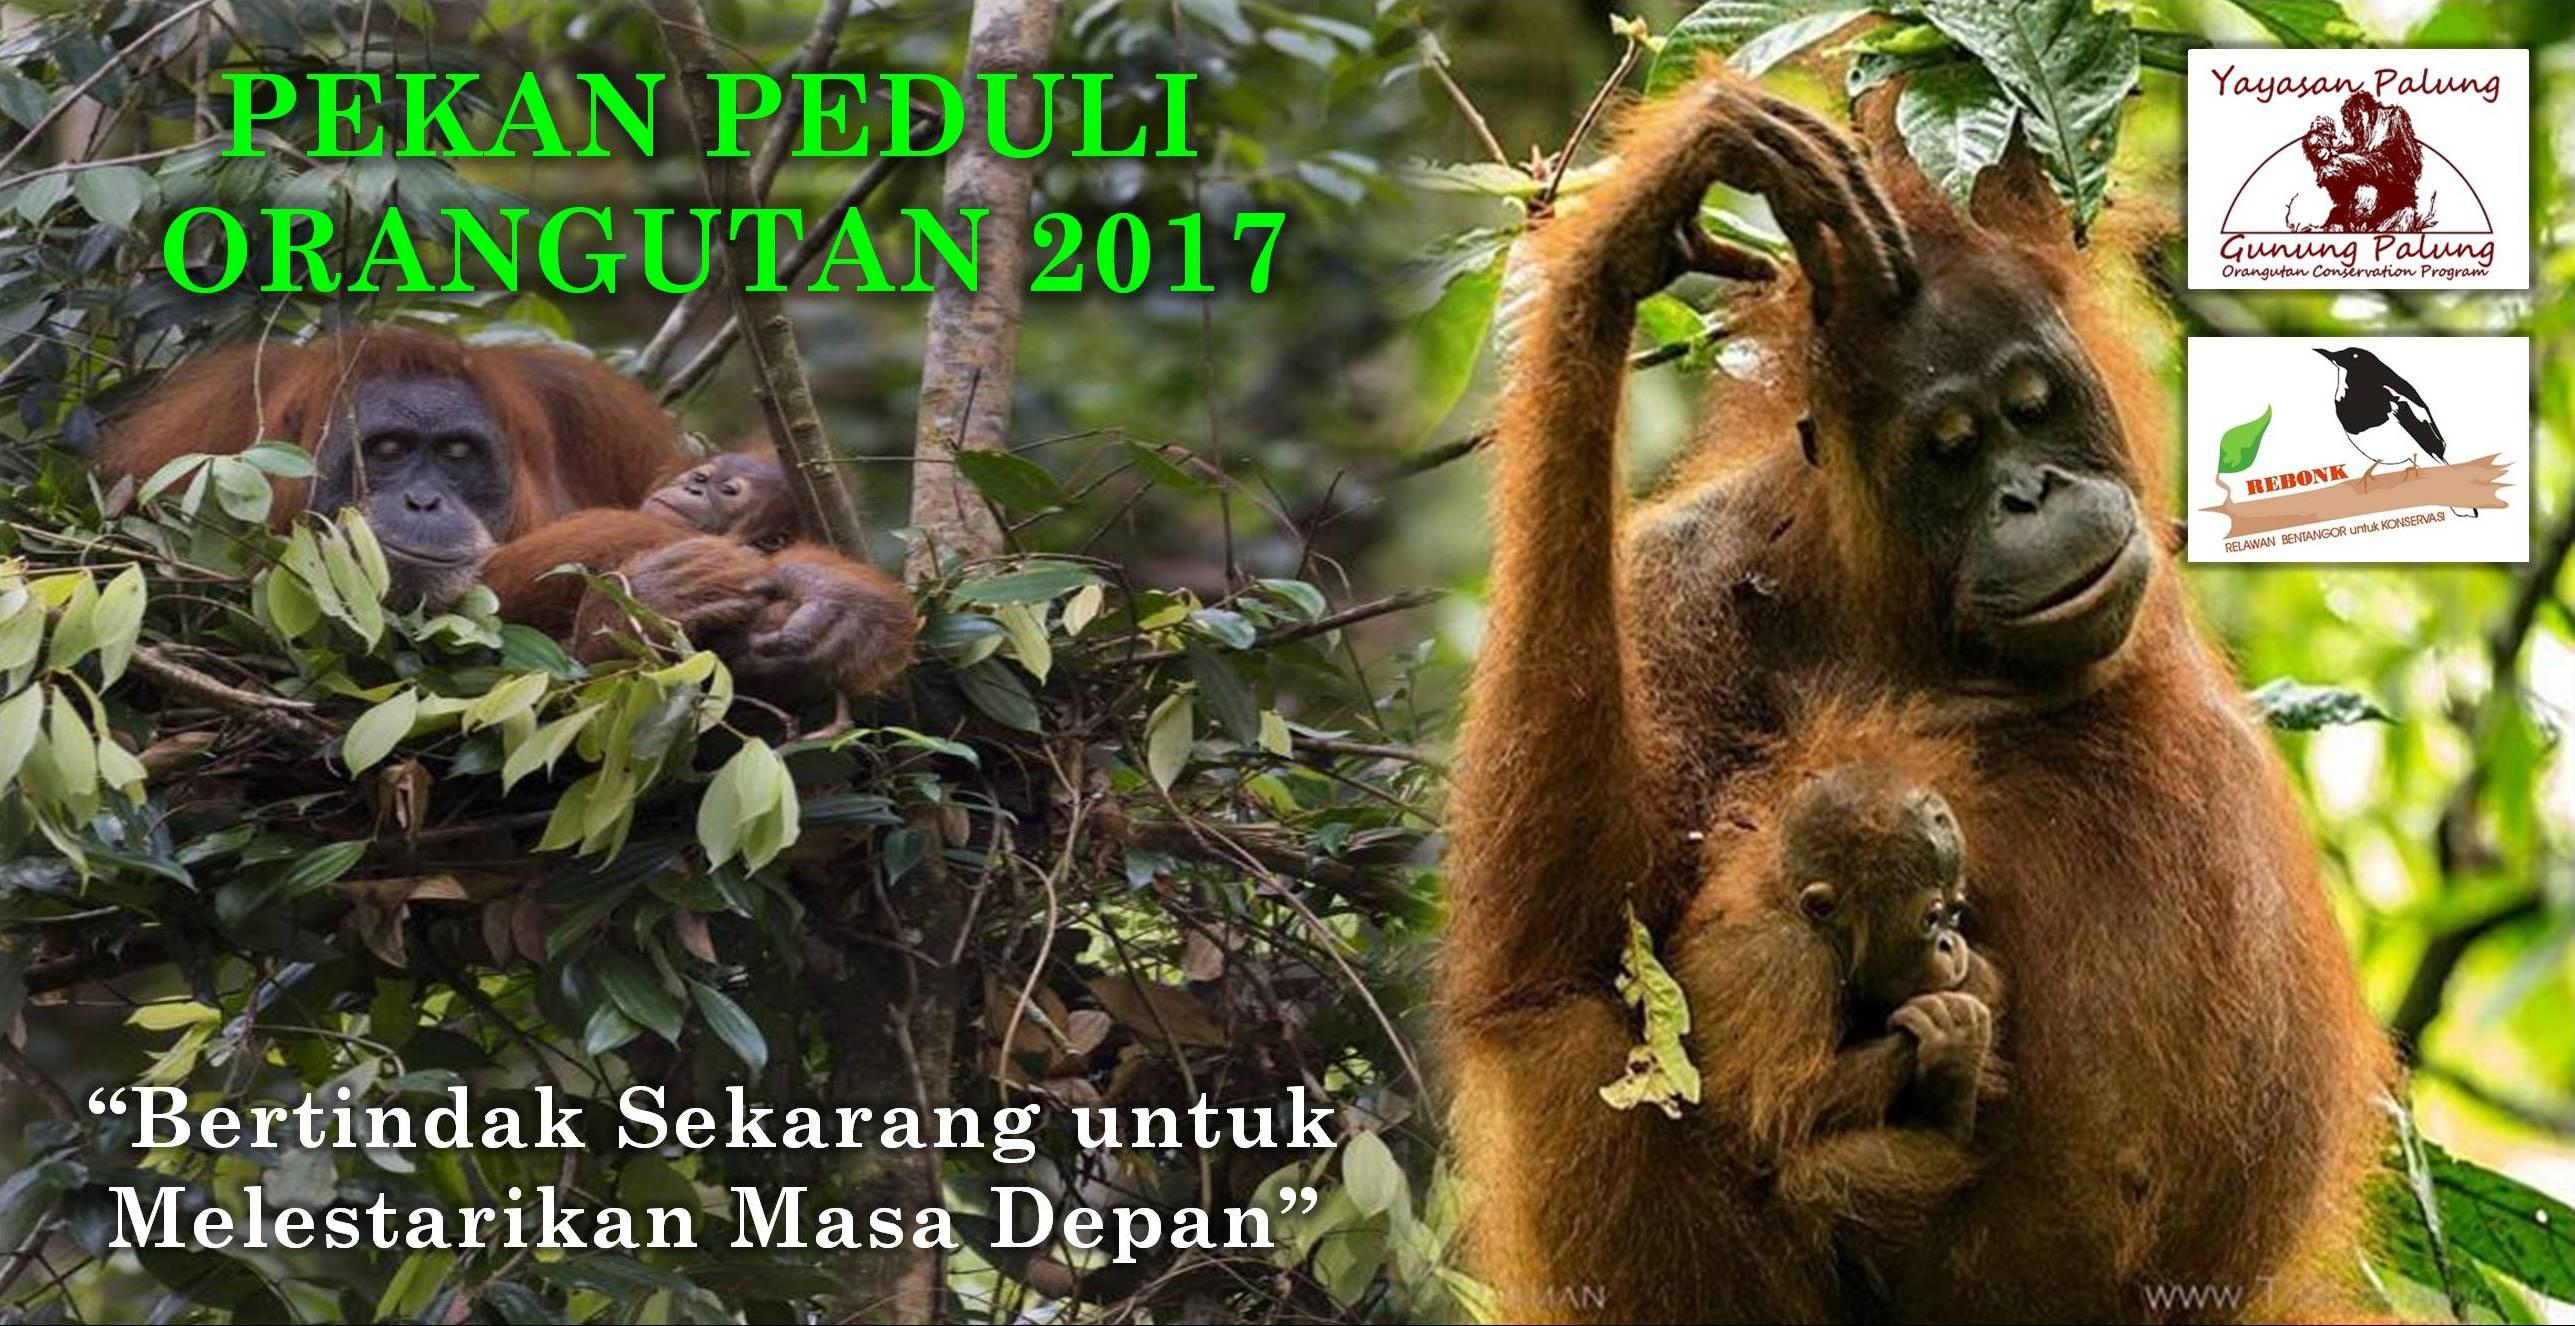 Mengapa Kita Penting Untuk Merayakan Pekan Peduli Orangutan